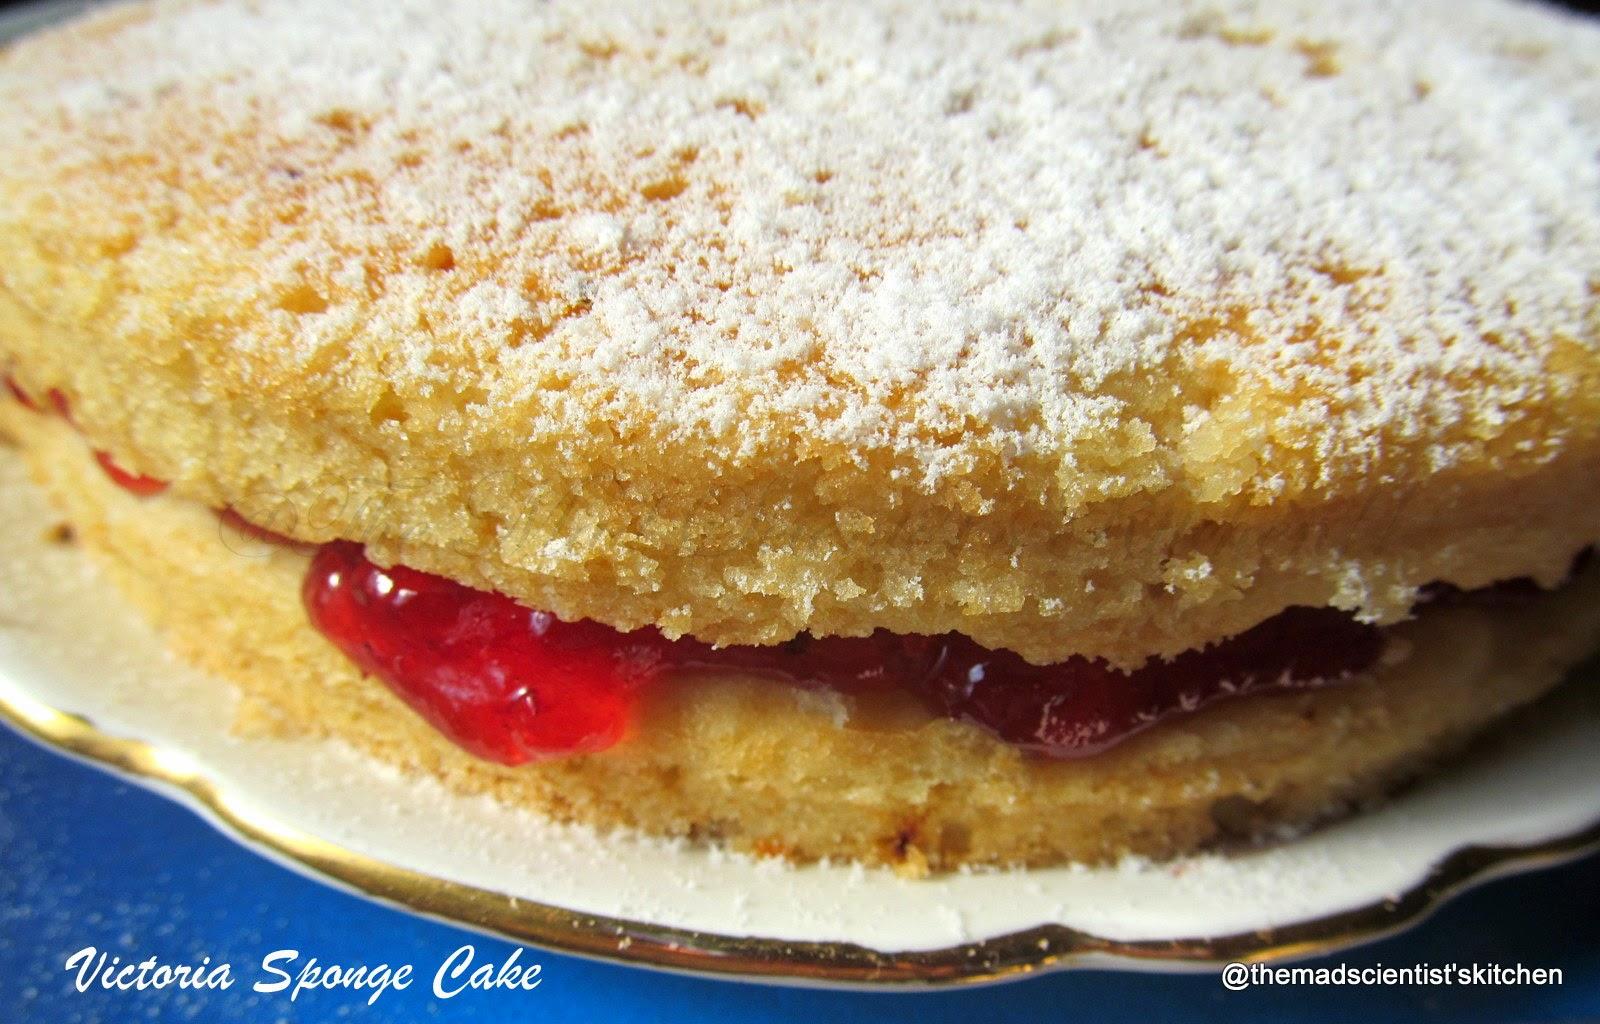 Victoria Sandwich Cake/ Victoria Sponge Cake